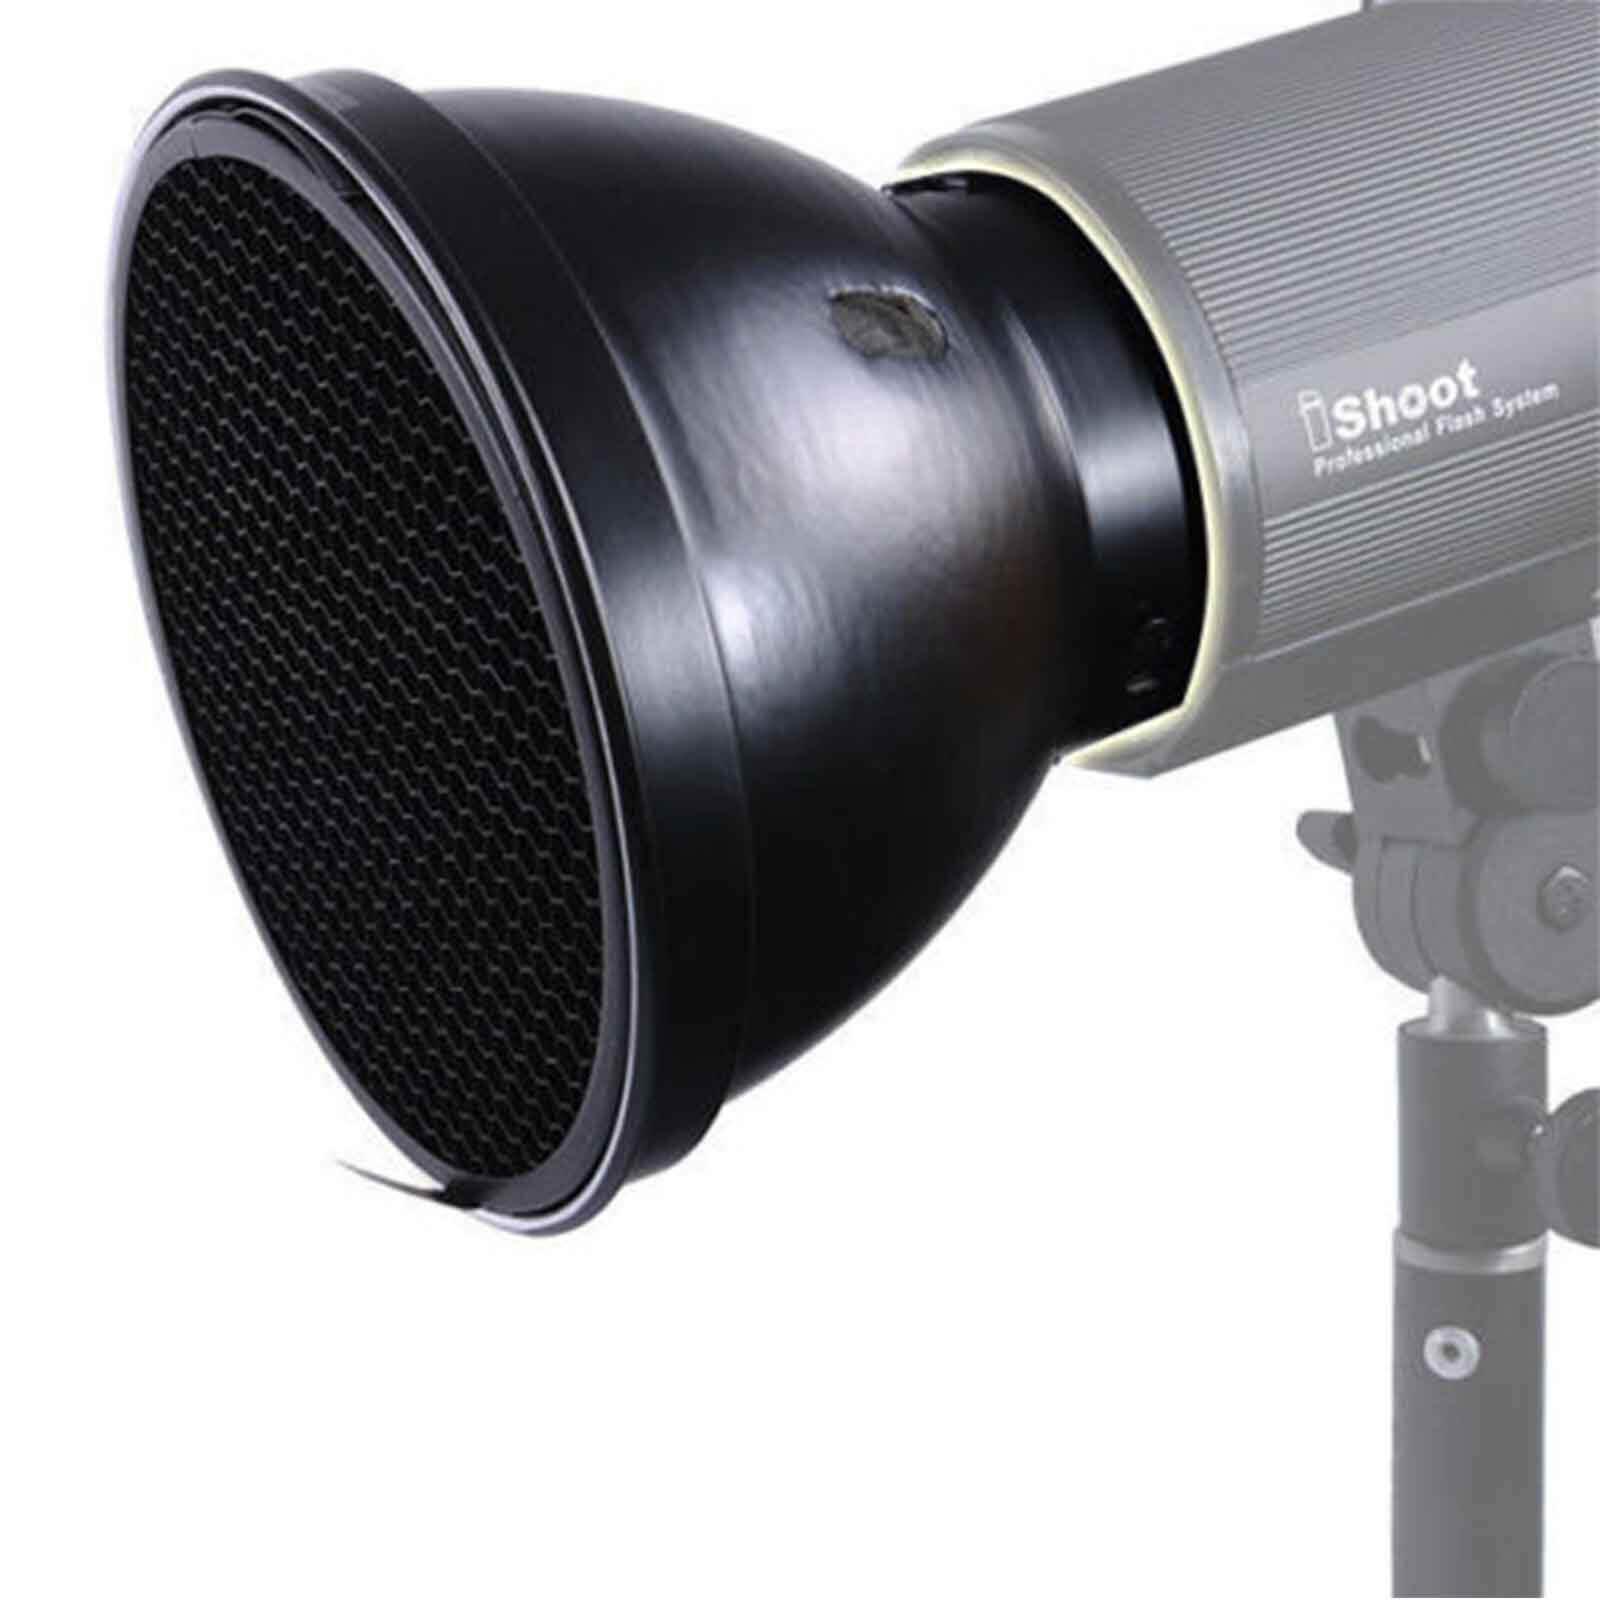 180mm Metal Lamp Shade Softbox+Honeycomb Grid for COMET Mount Studio Flash Light